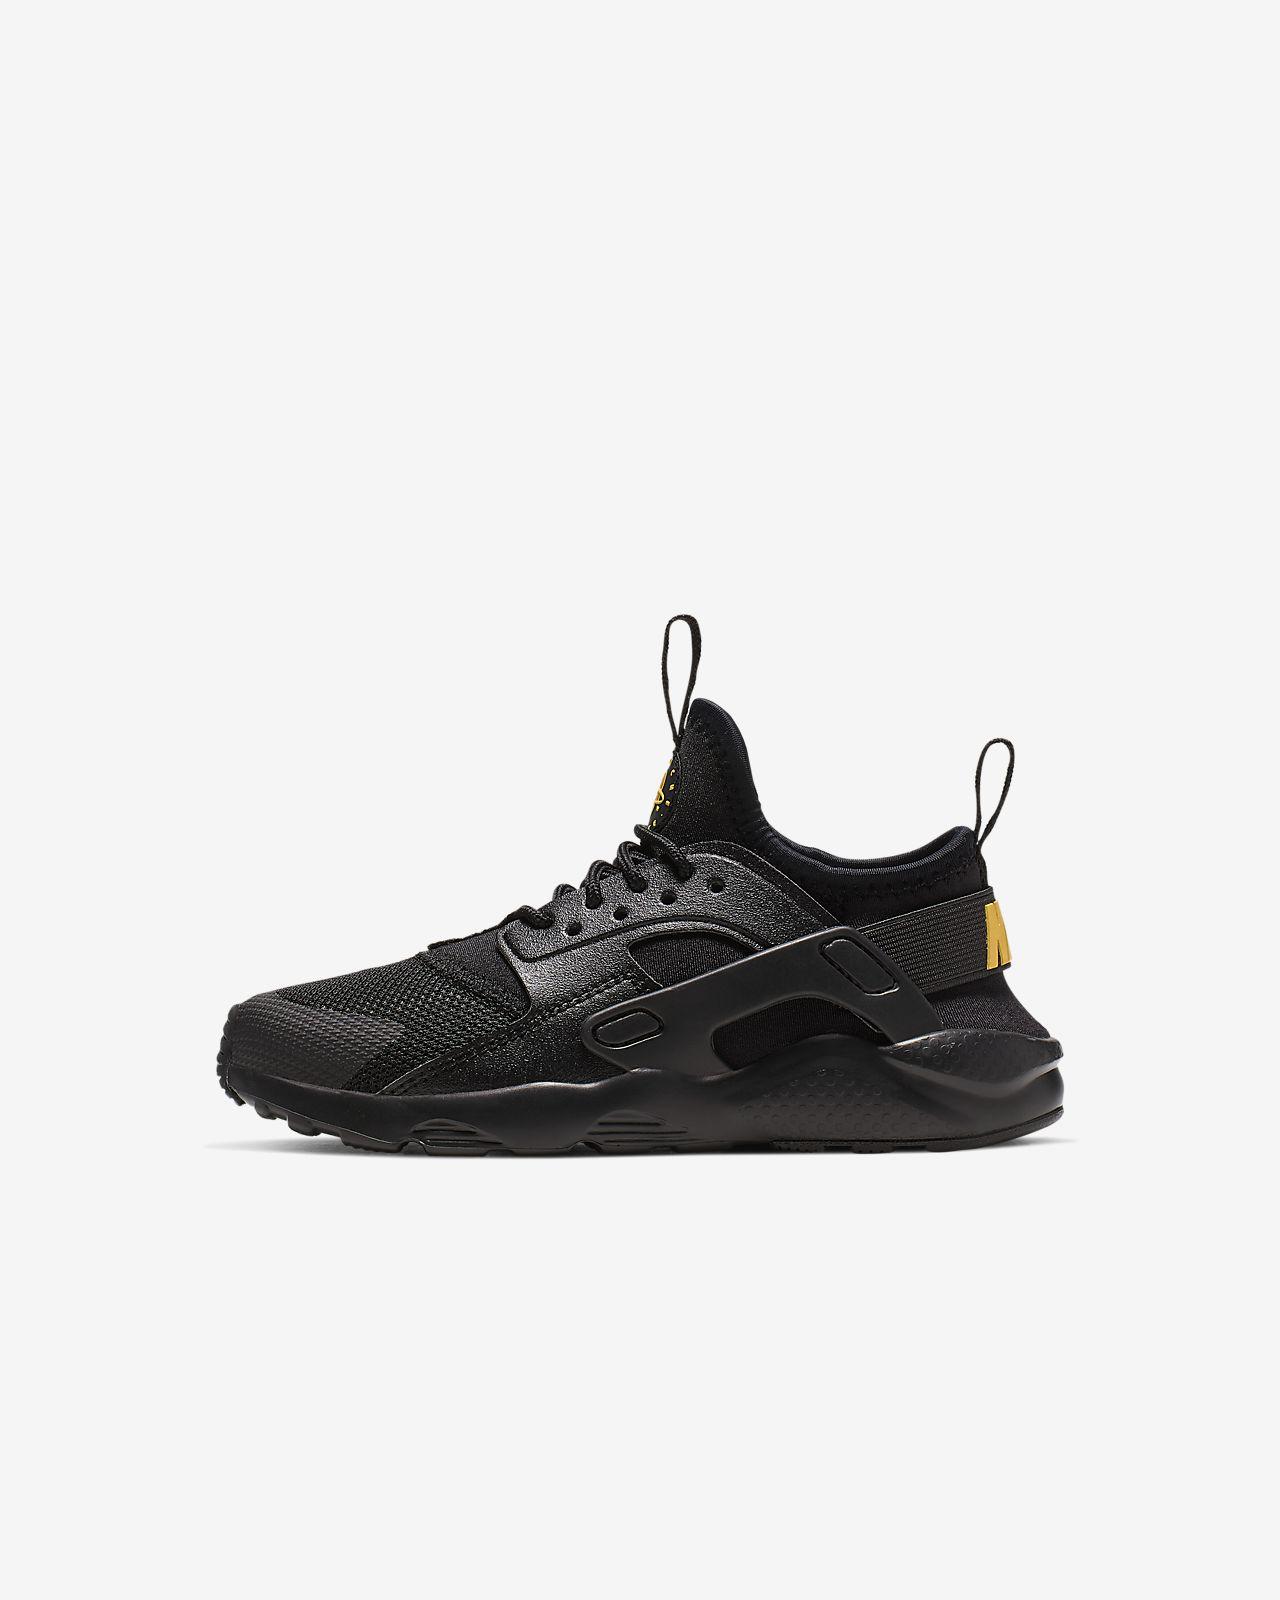 on sale eec1f 5f577 ... Chaussure Nike Huarache Run Ultra pour Jeune enfant